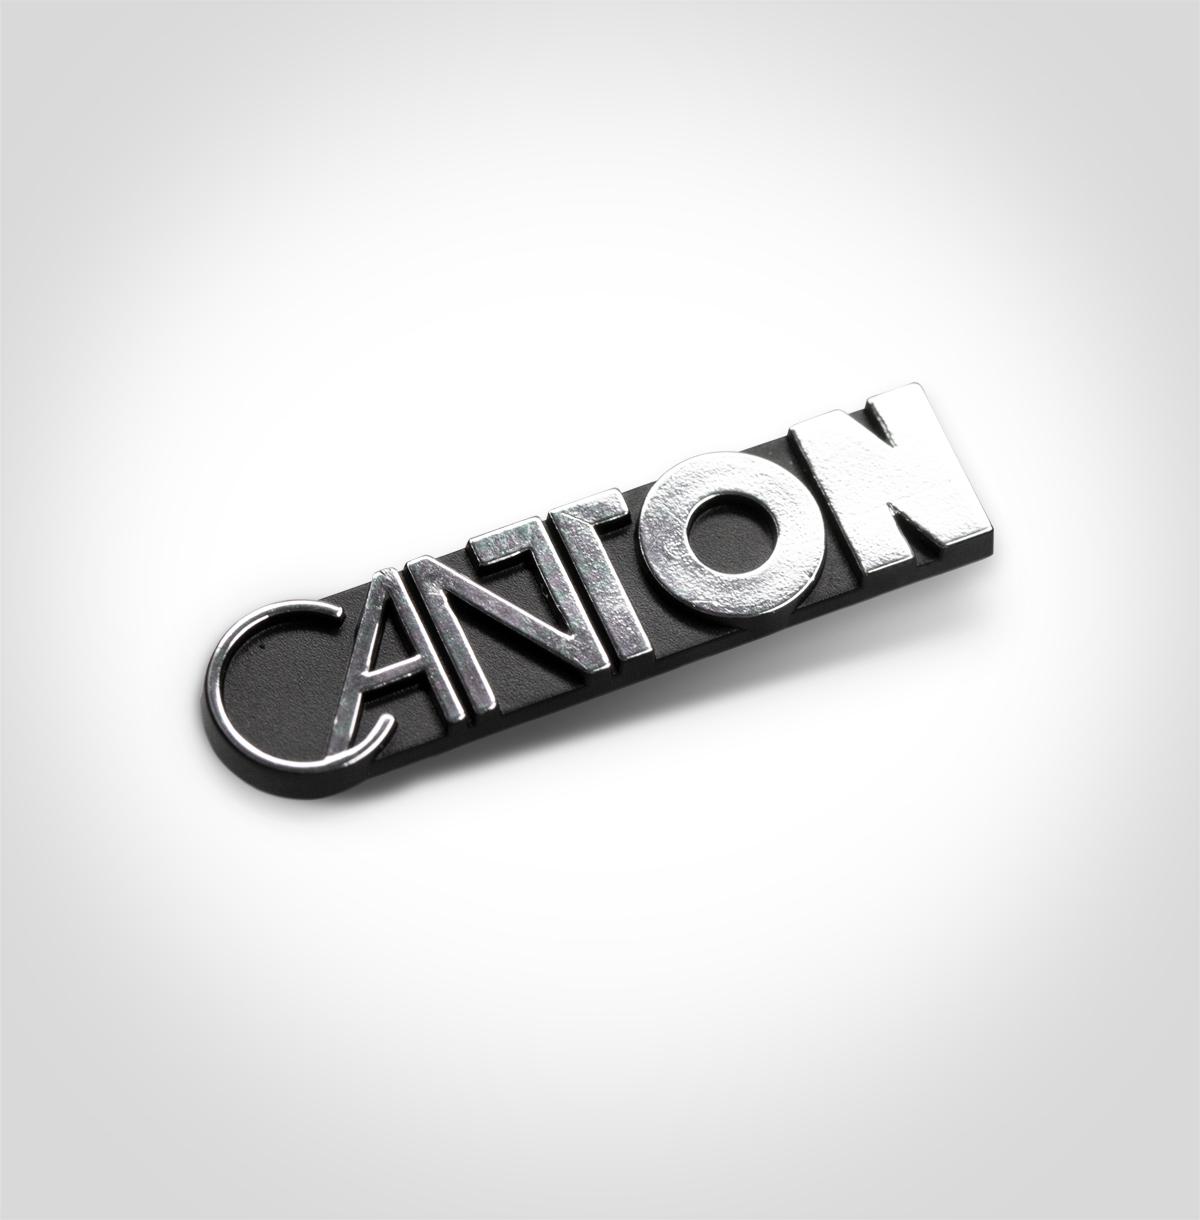 Bild: Kunstoff Soundlogo Canton Interieur